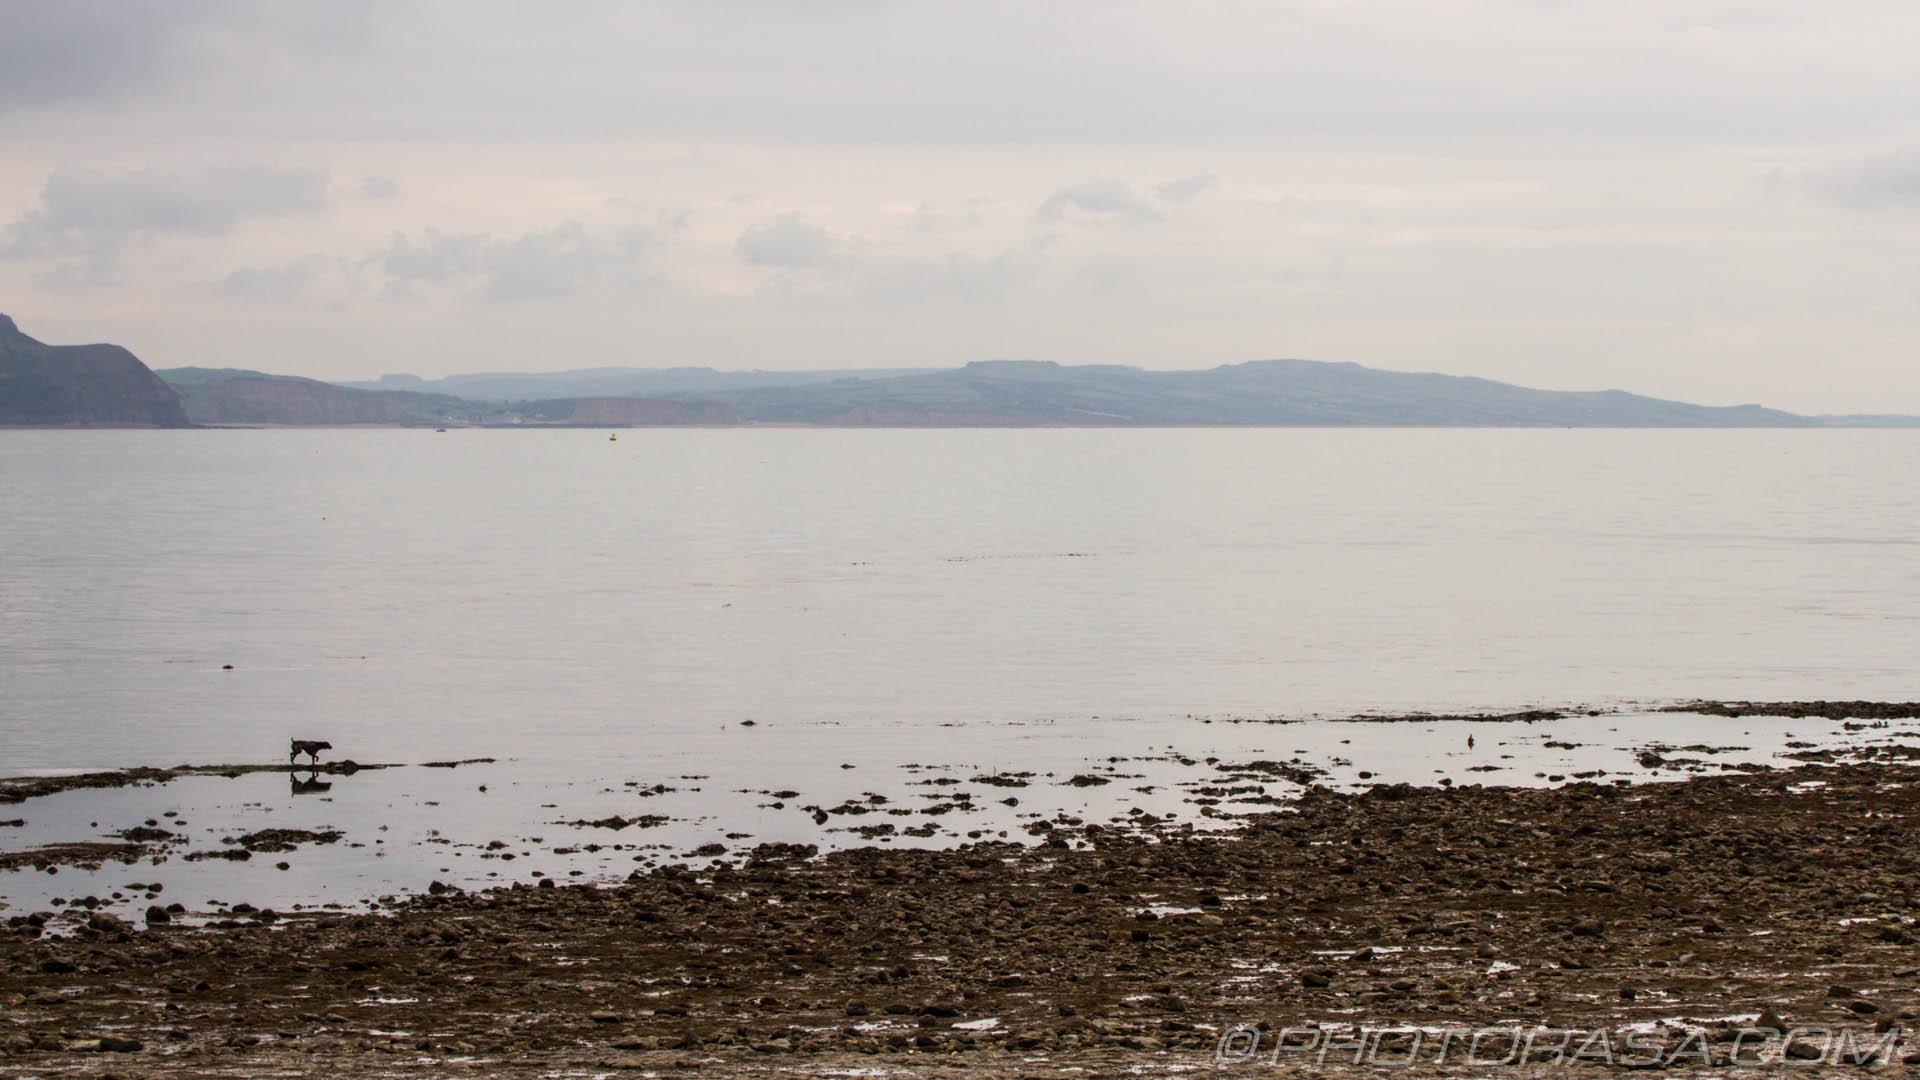 https://photorasa.com/walking-dog-jurassic-coast/coastal-view-with-dog/